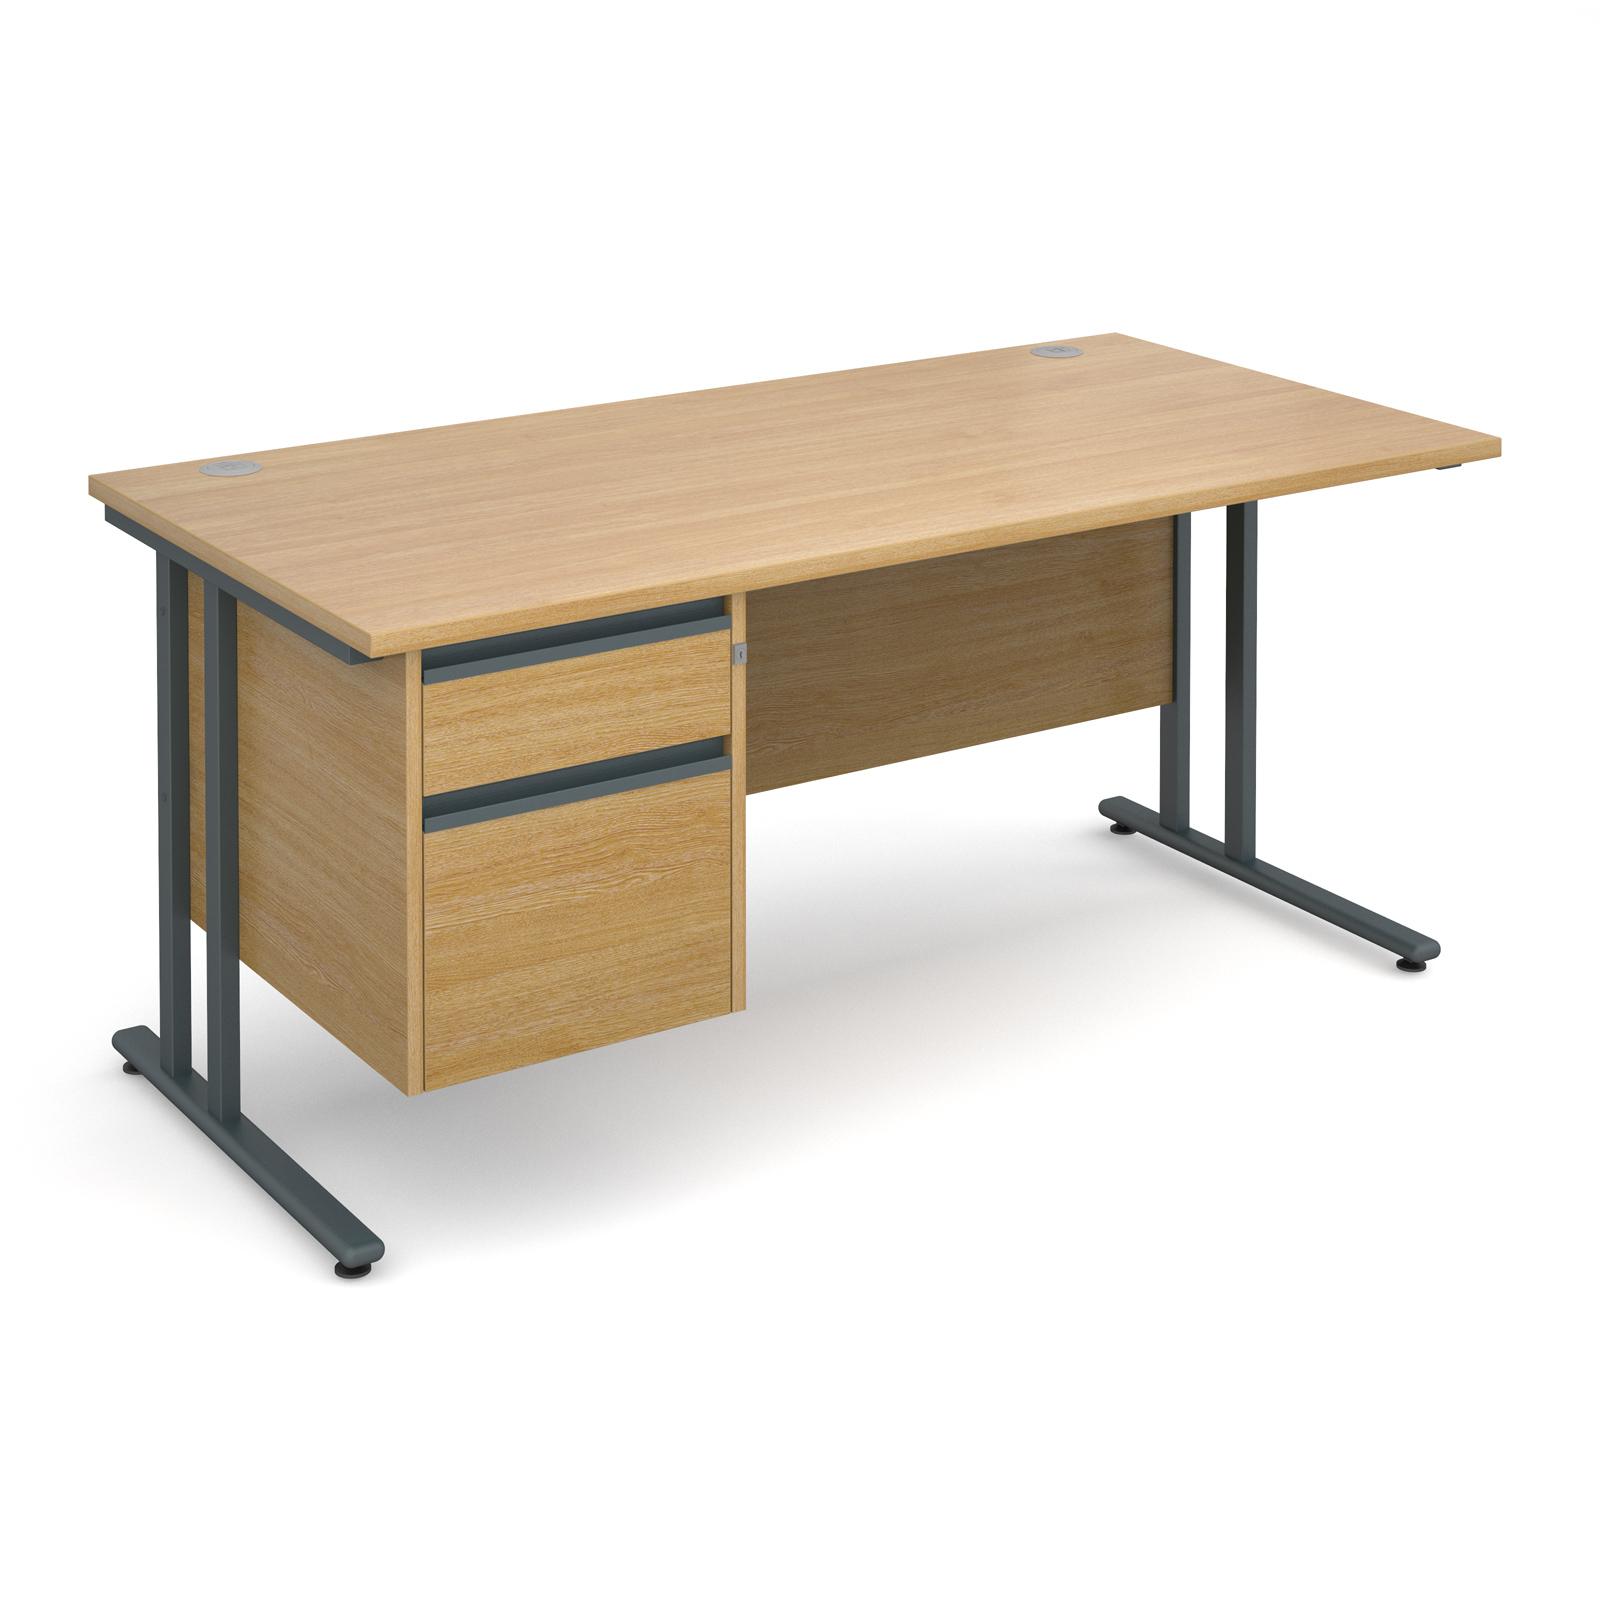 Maestro 25 Gl Straight Desk With 2 Drawer Pedestal 1600mm Graphite Cantilever Frame Oak Top